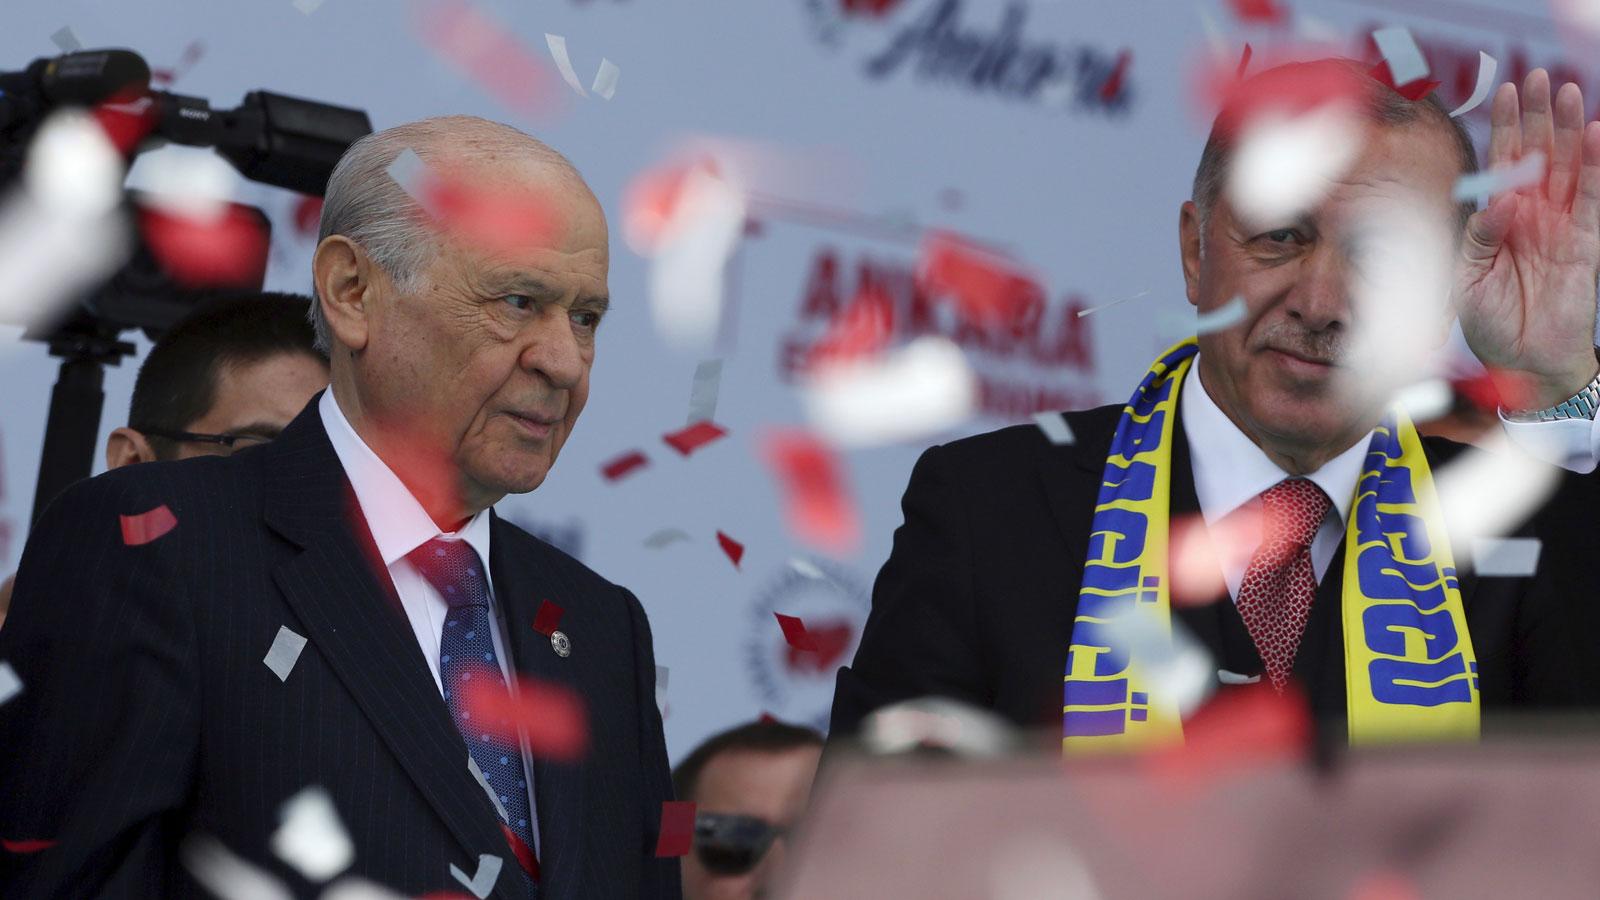 Yeni Yargı Paketi'nde flaş gelişme! AK Parti MHP'ye sundu...